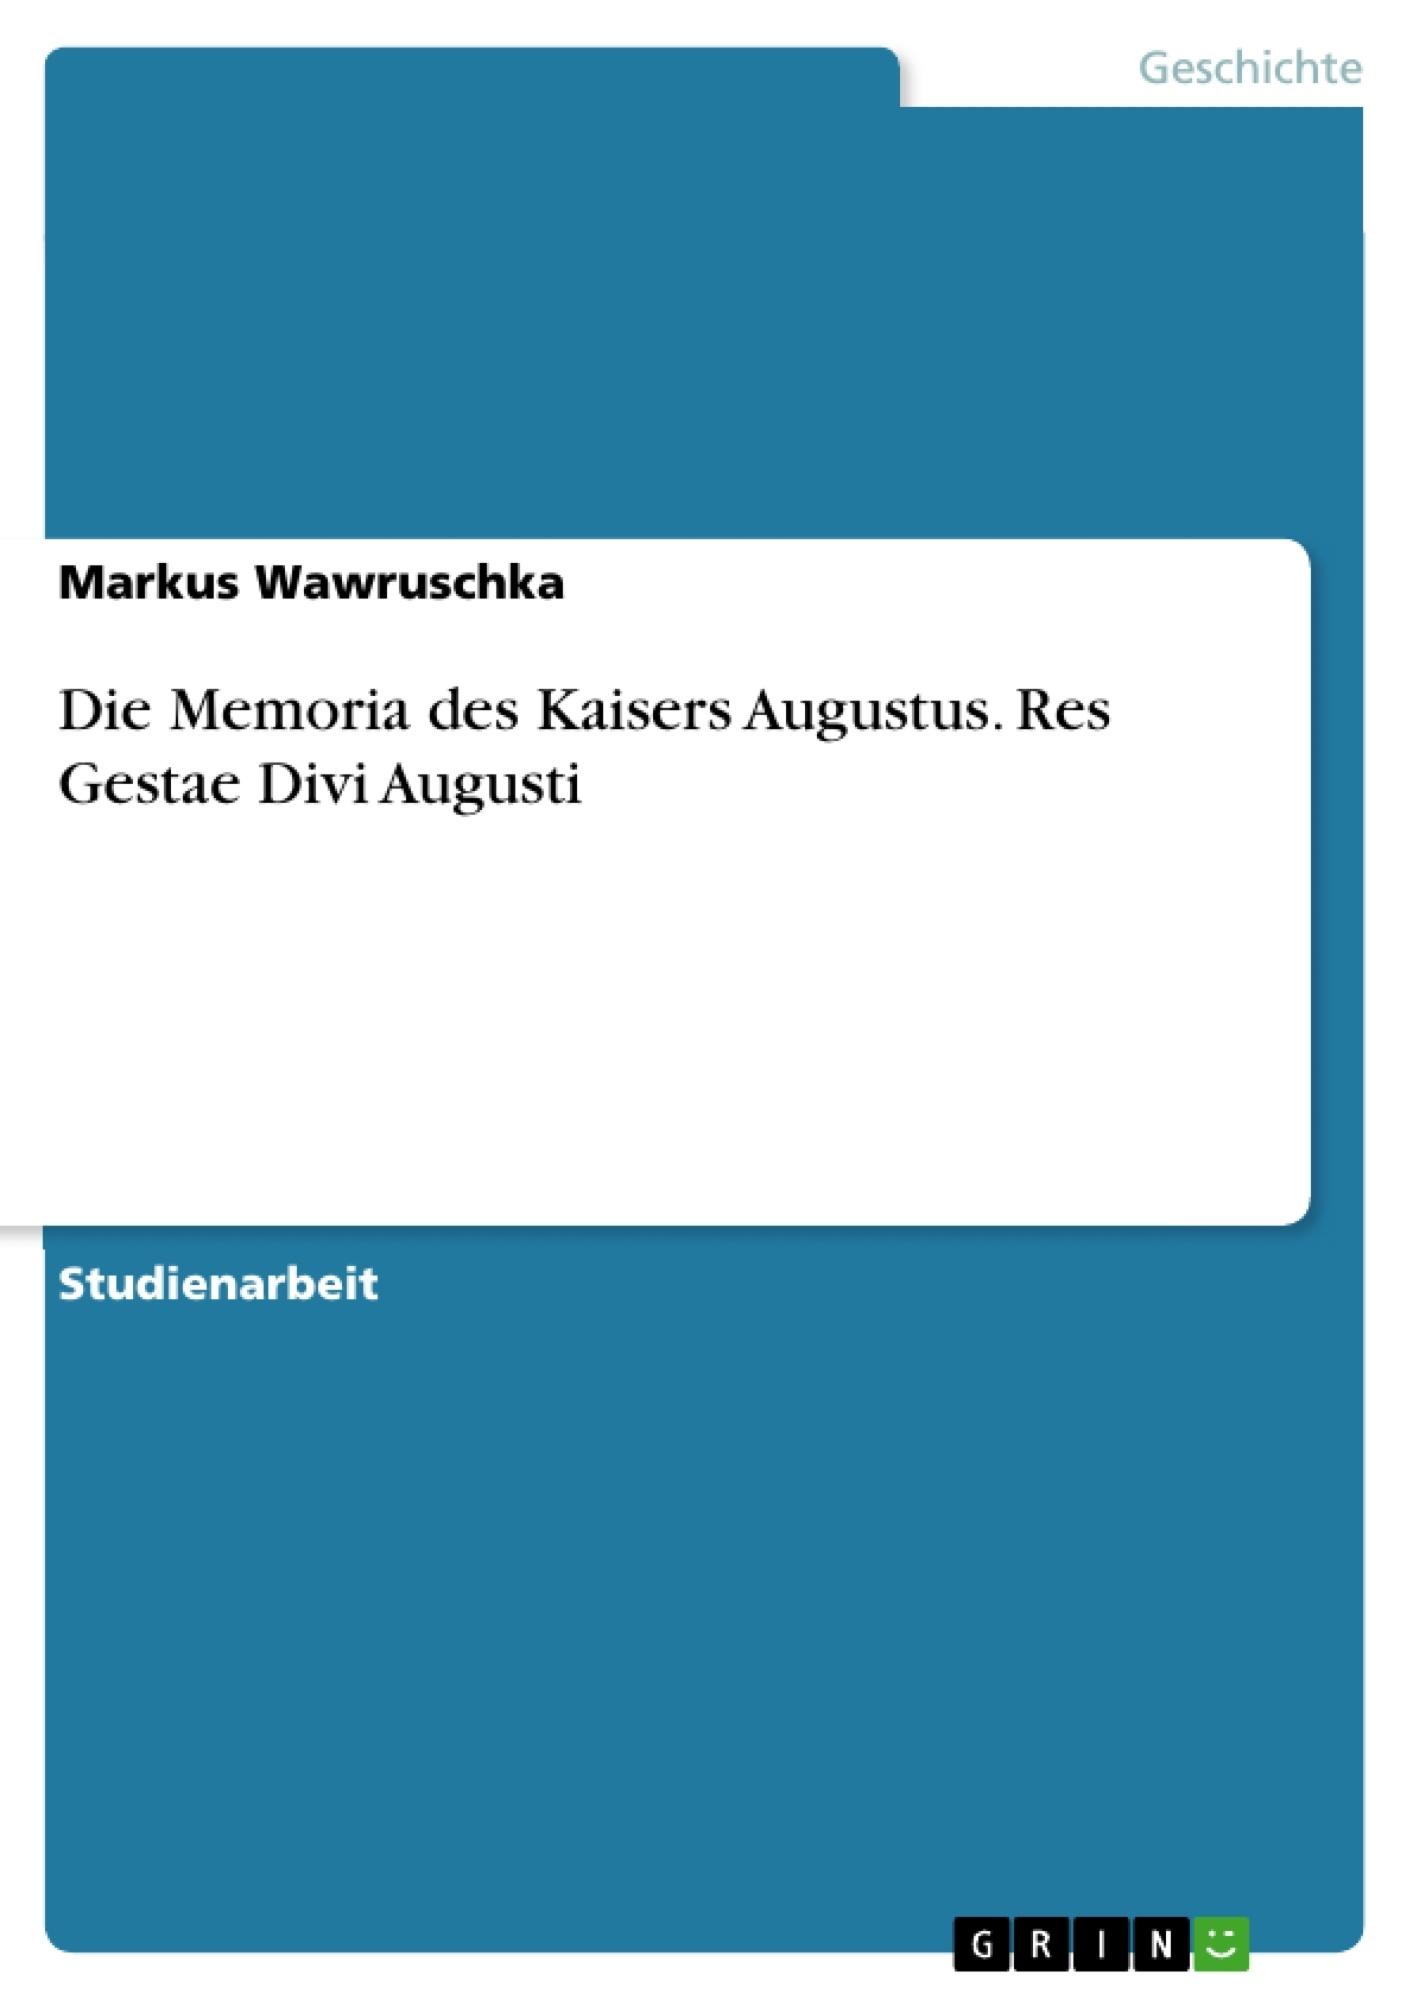 Titel: Die Memoria des Kaisers Augustus. Res Gestae Divi Augusti